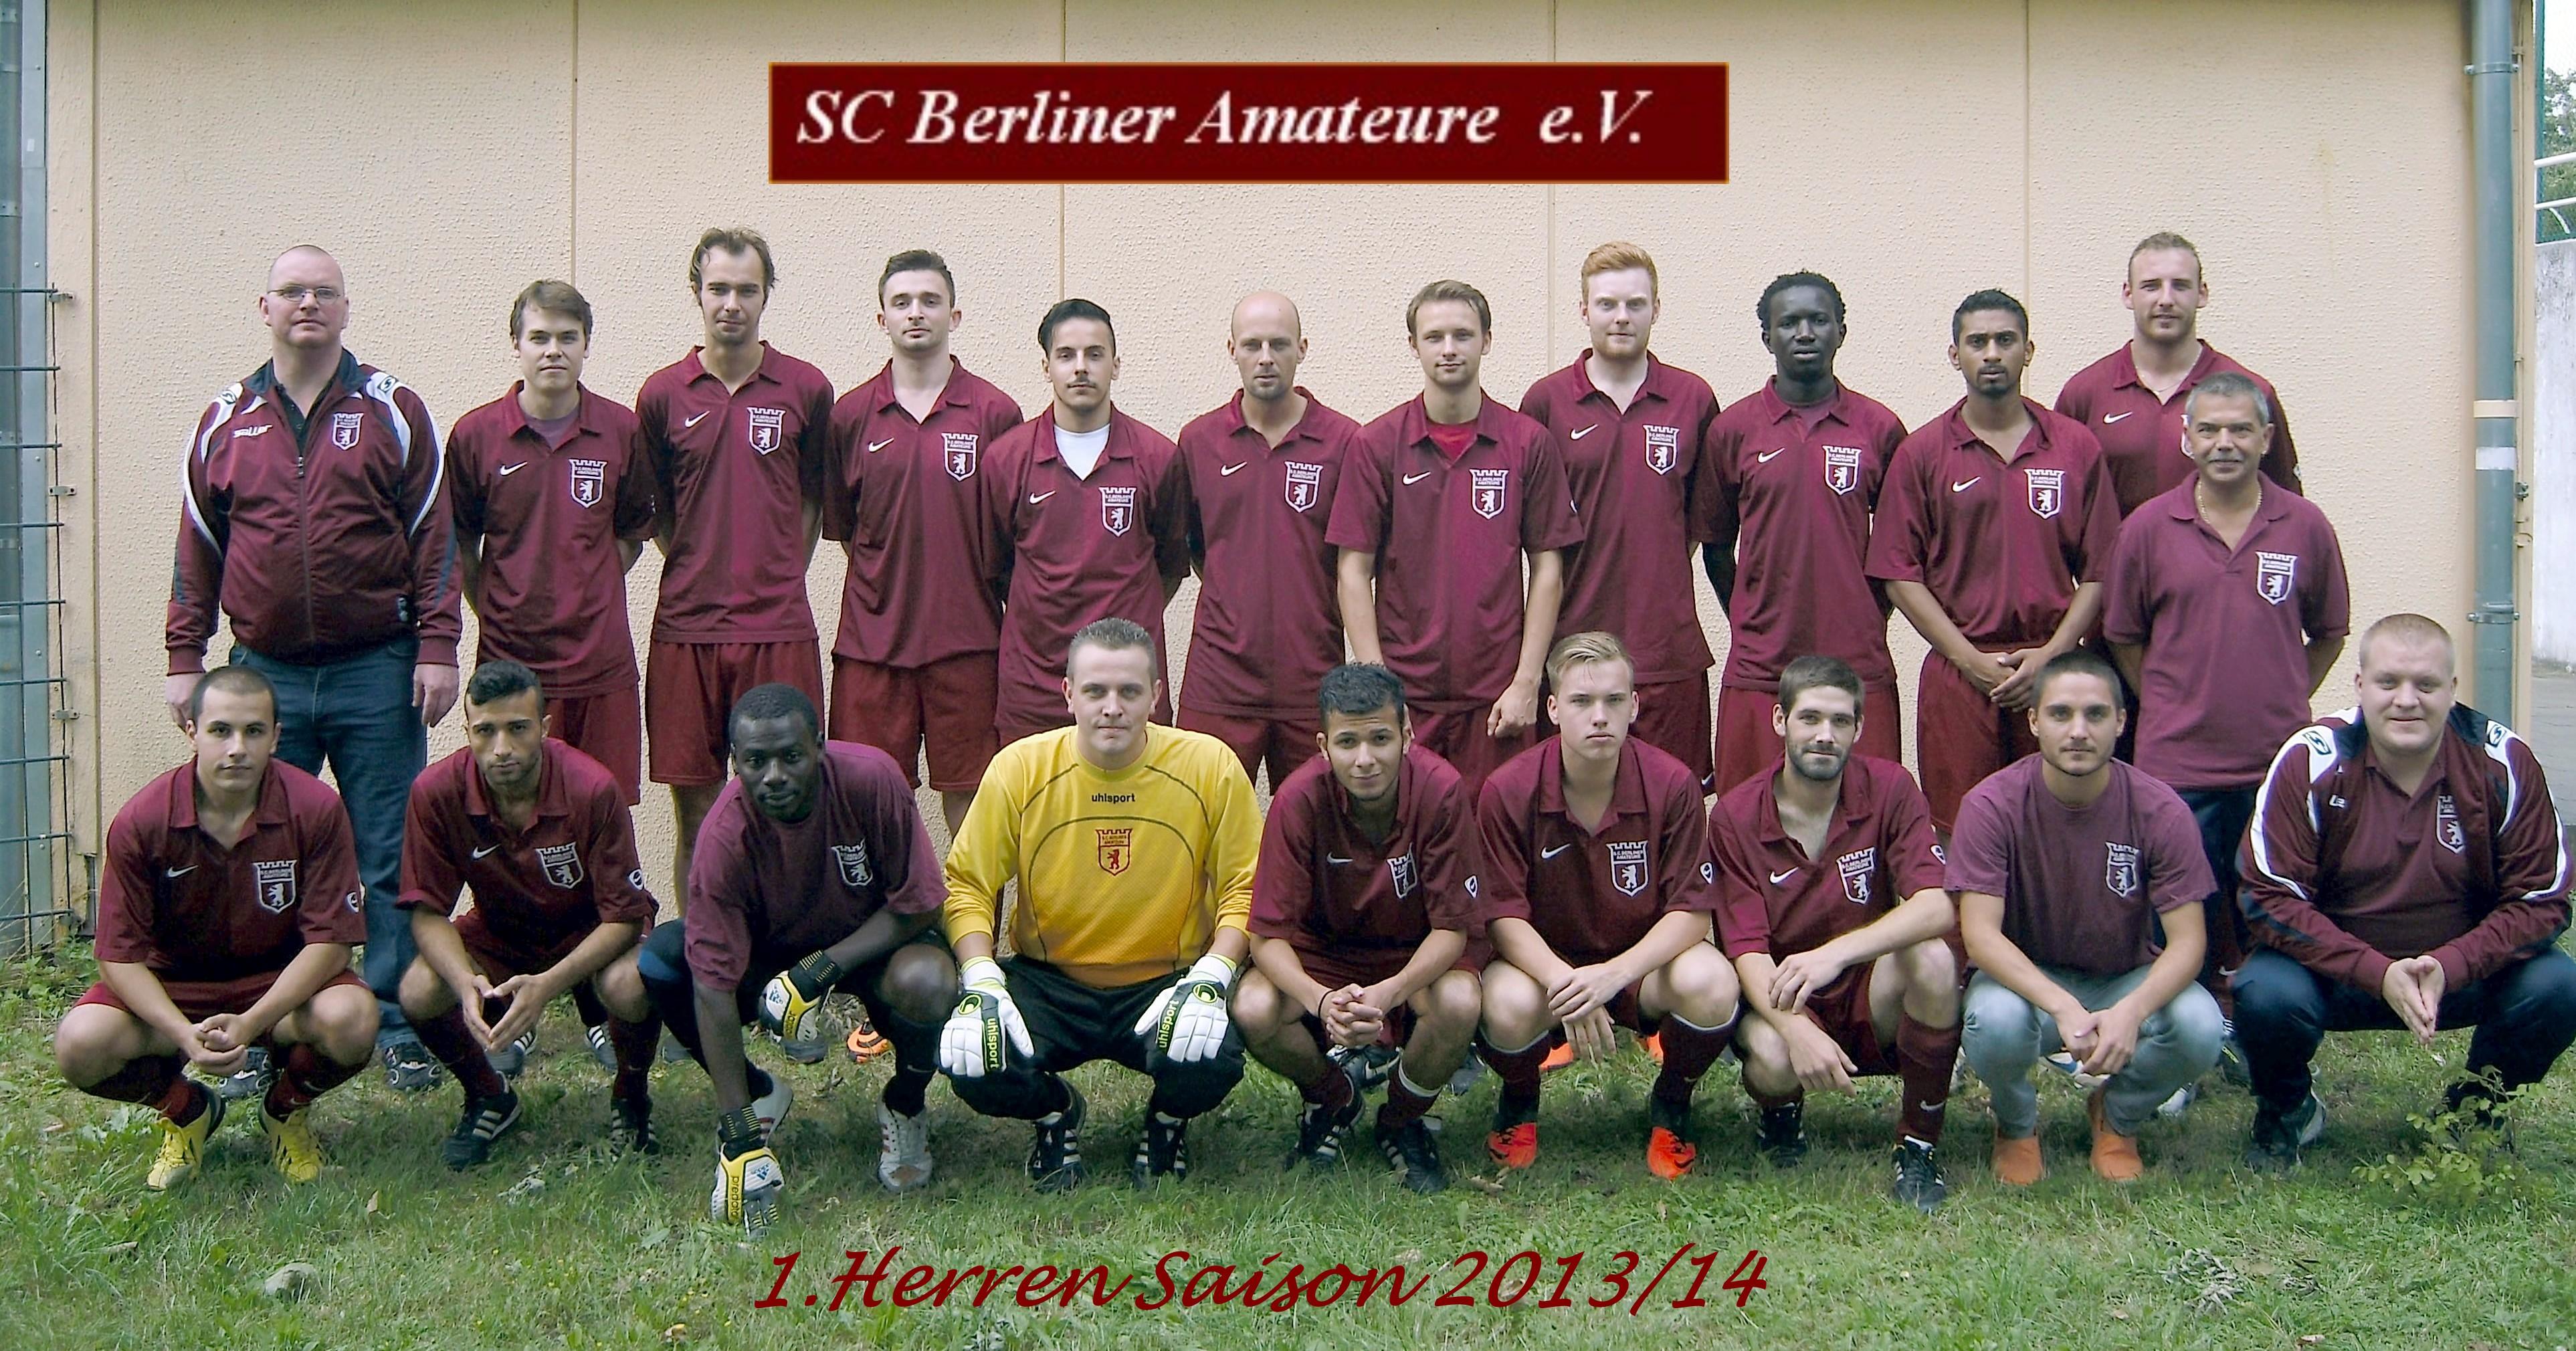 Sc Berliner Amateure